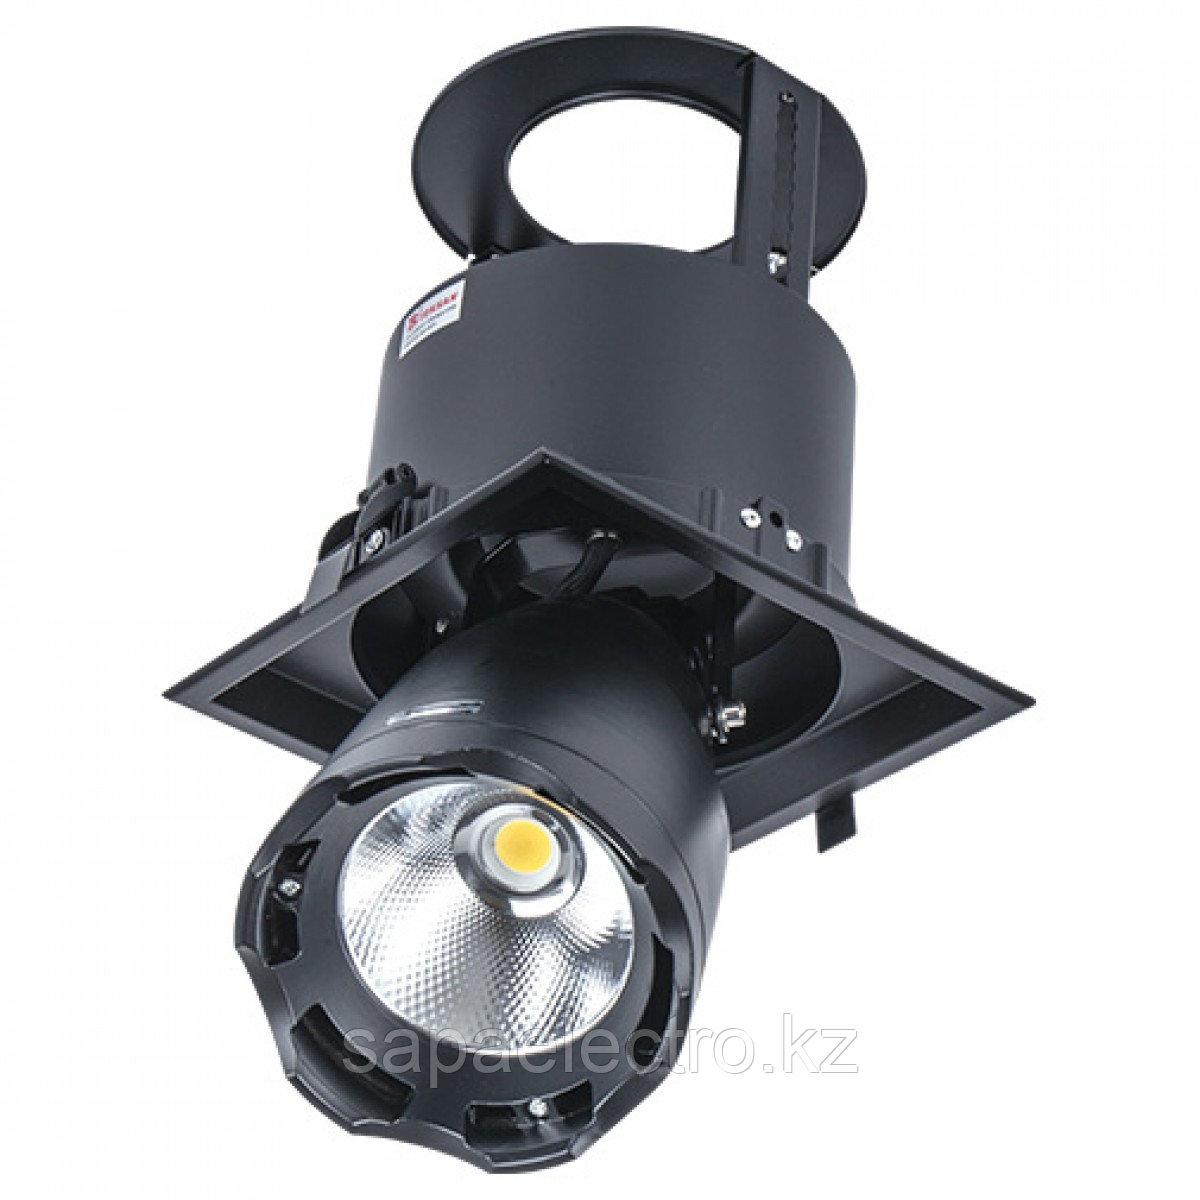 Свет-к DL LED LS-DK914-1 40W BLACK  5700K(TS)8шт